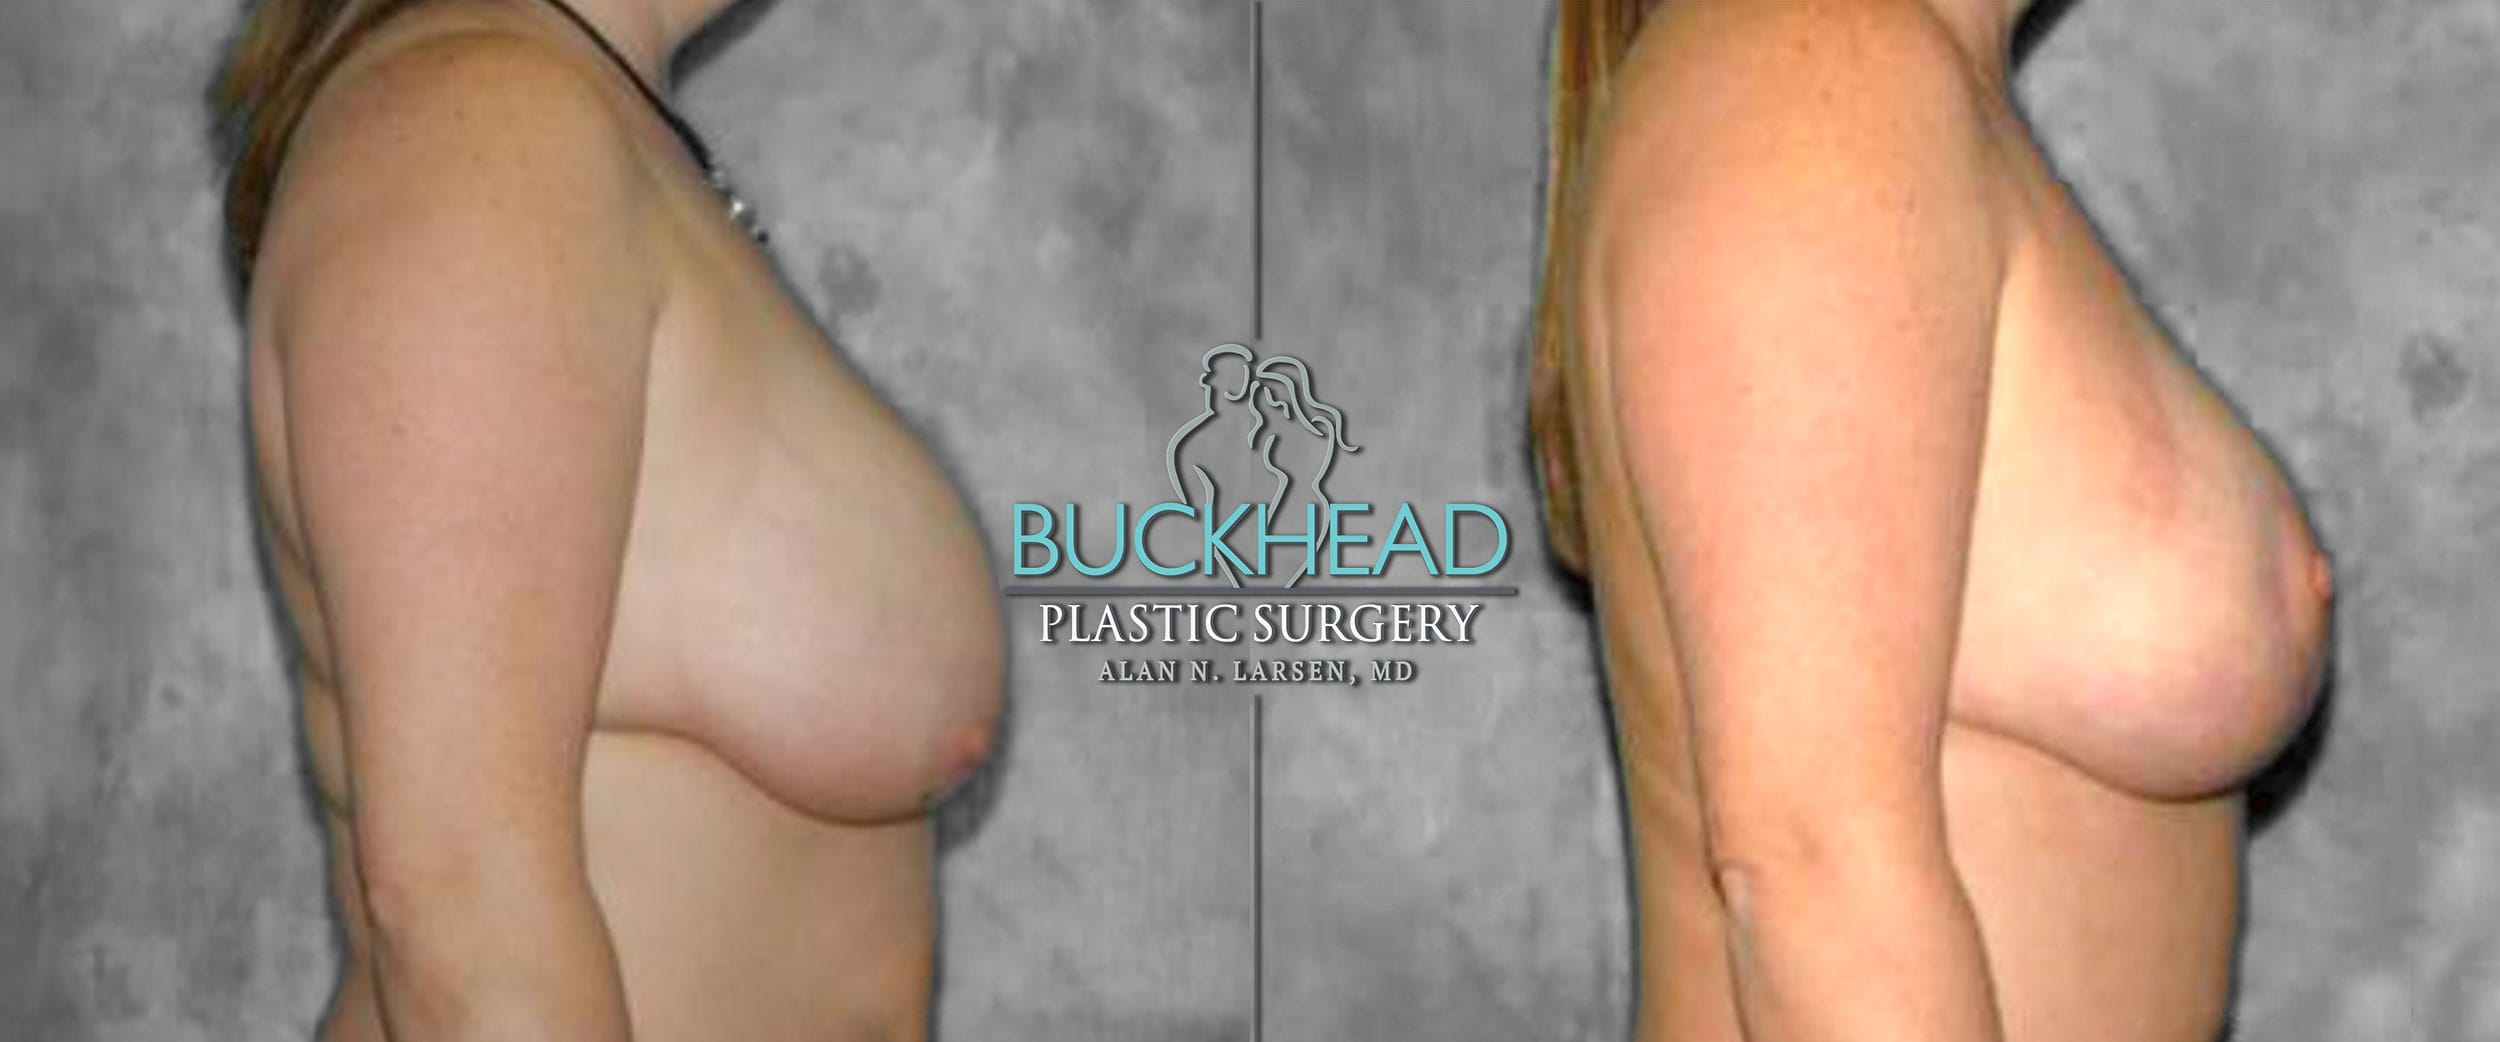 Before and After Photo Gallery   Breast Lift   Buckhead Plastic Surgery   Alan N. Larsen, MD   Board-Certified Plastic Surgeon   Atlanta GA